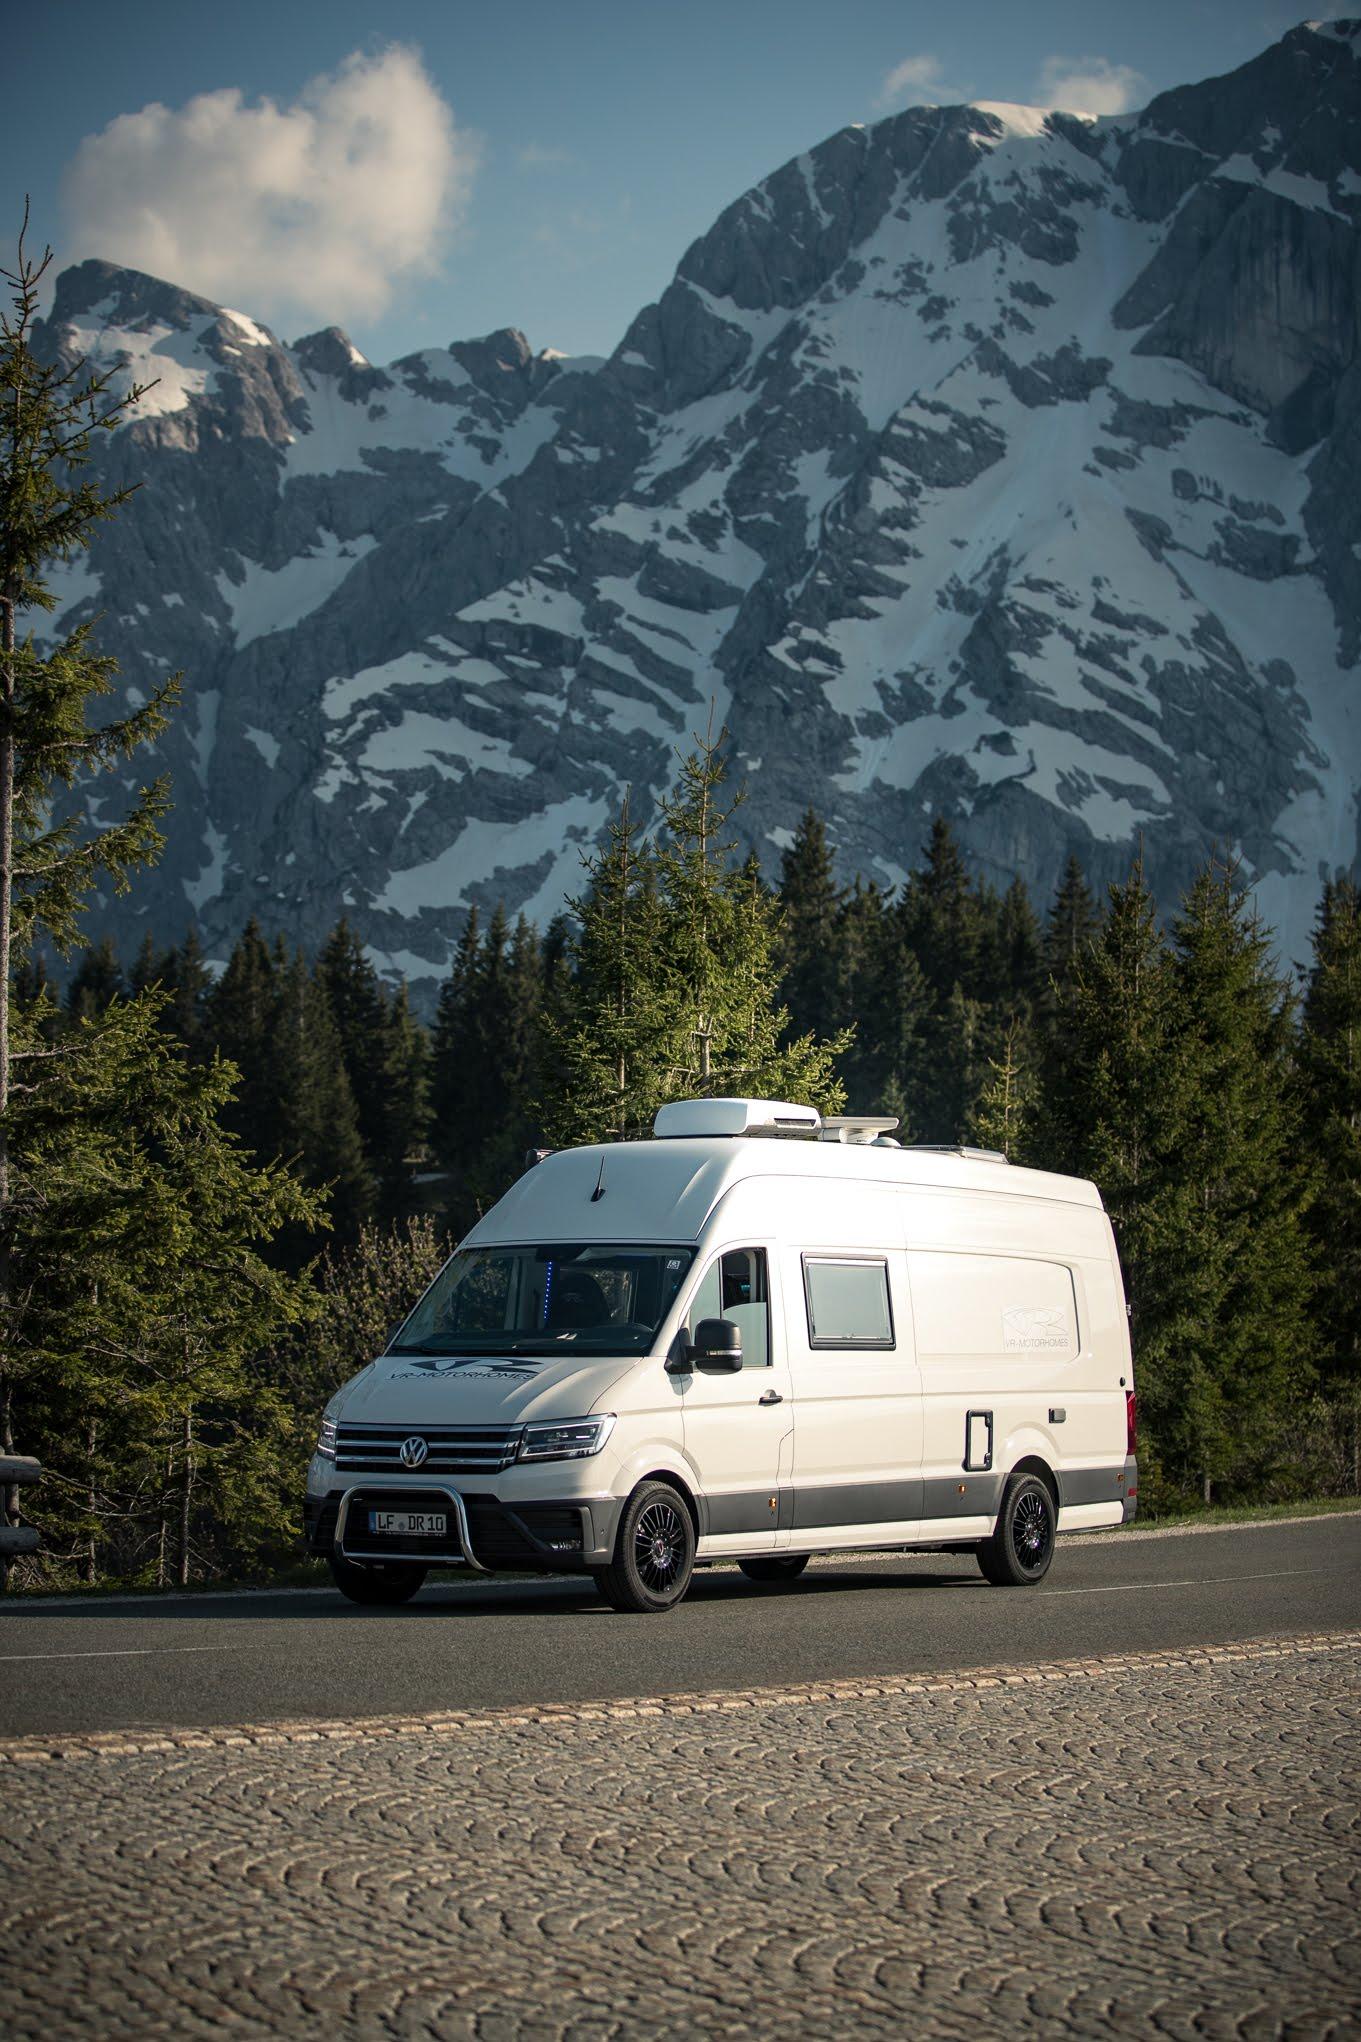 camping im kastenwagen ausgebaut umgebaut vanconversion vr-motorhomes